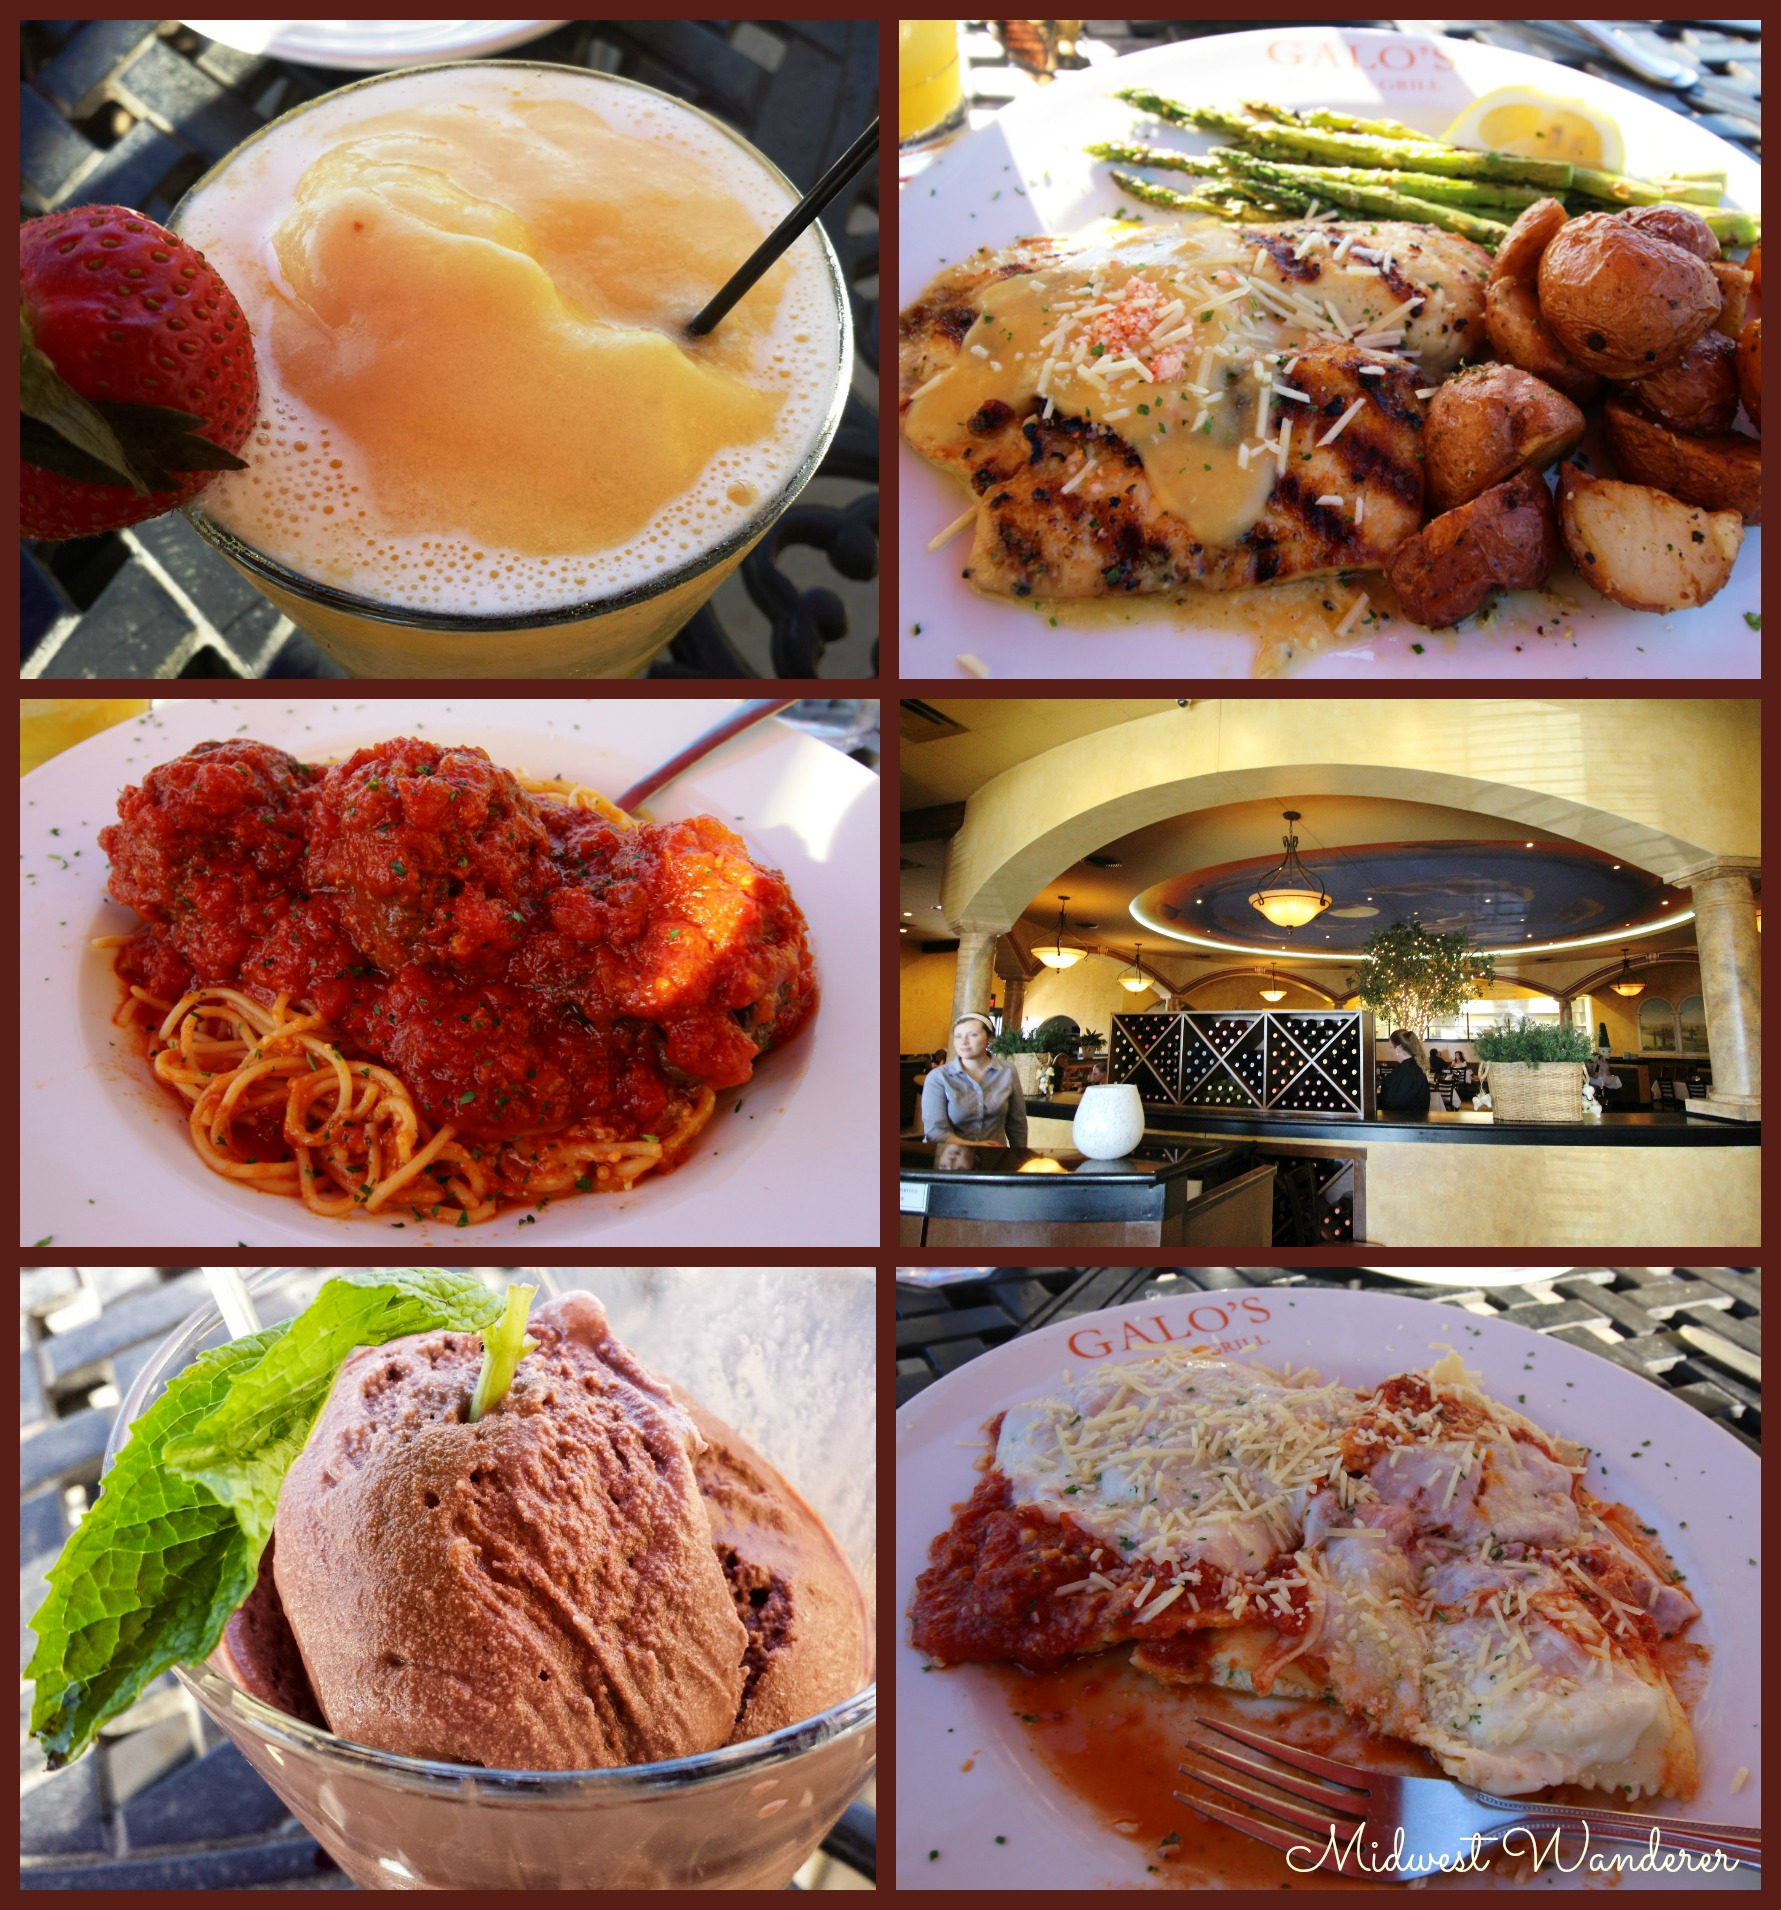 Galos Italian Grill